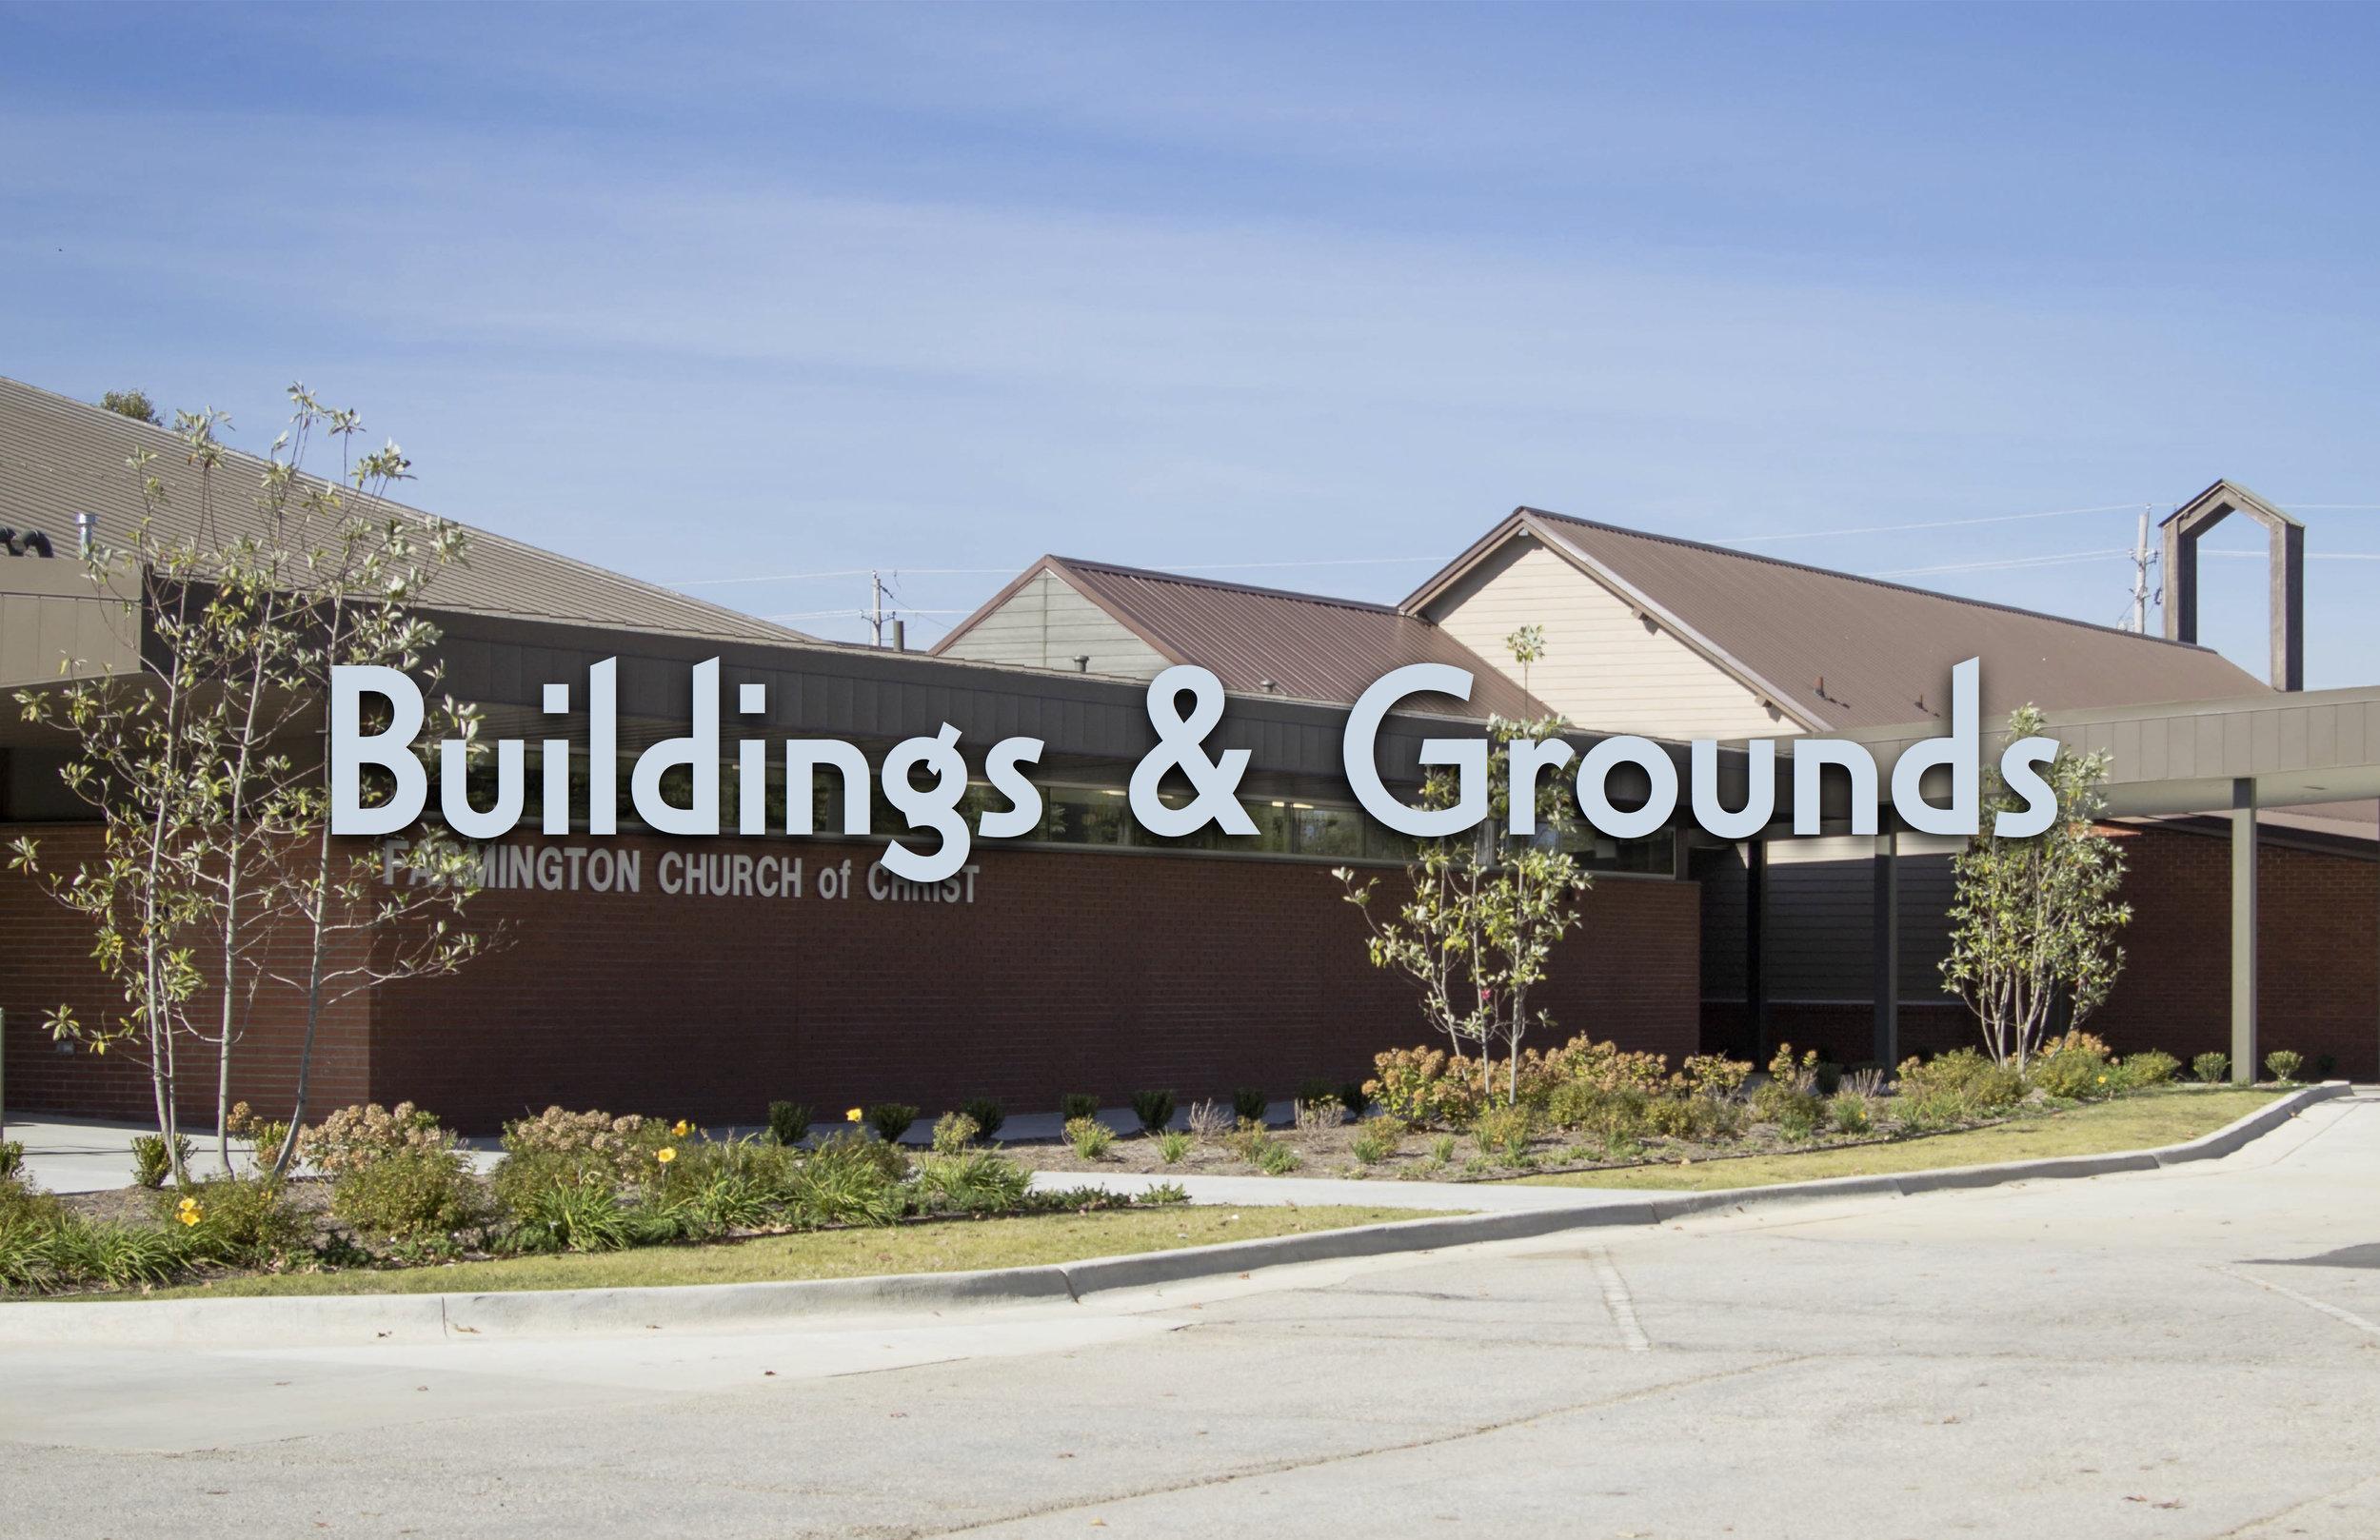 Buildings & Grounds.jpg